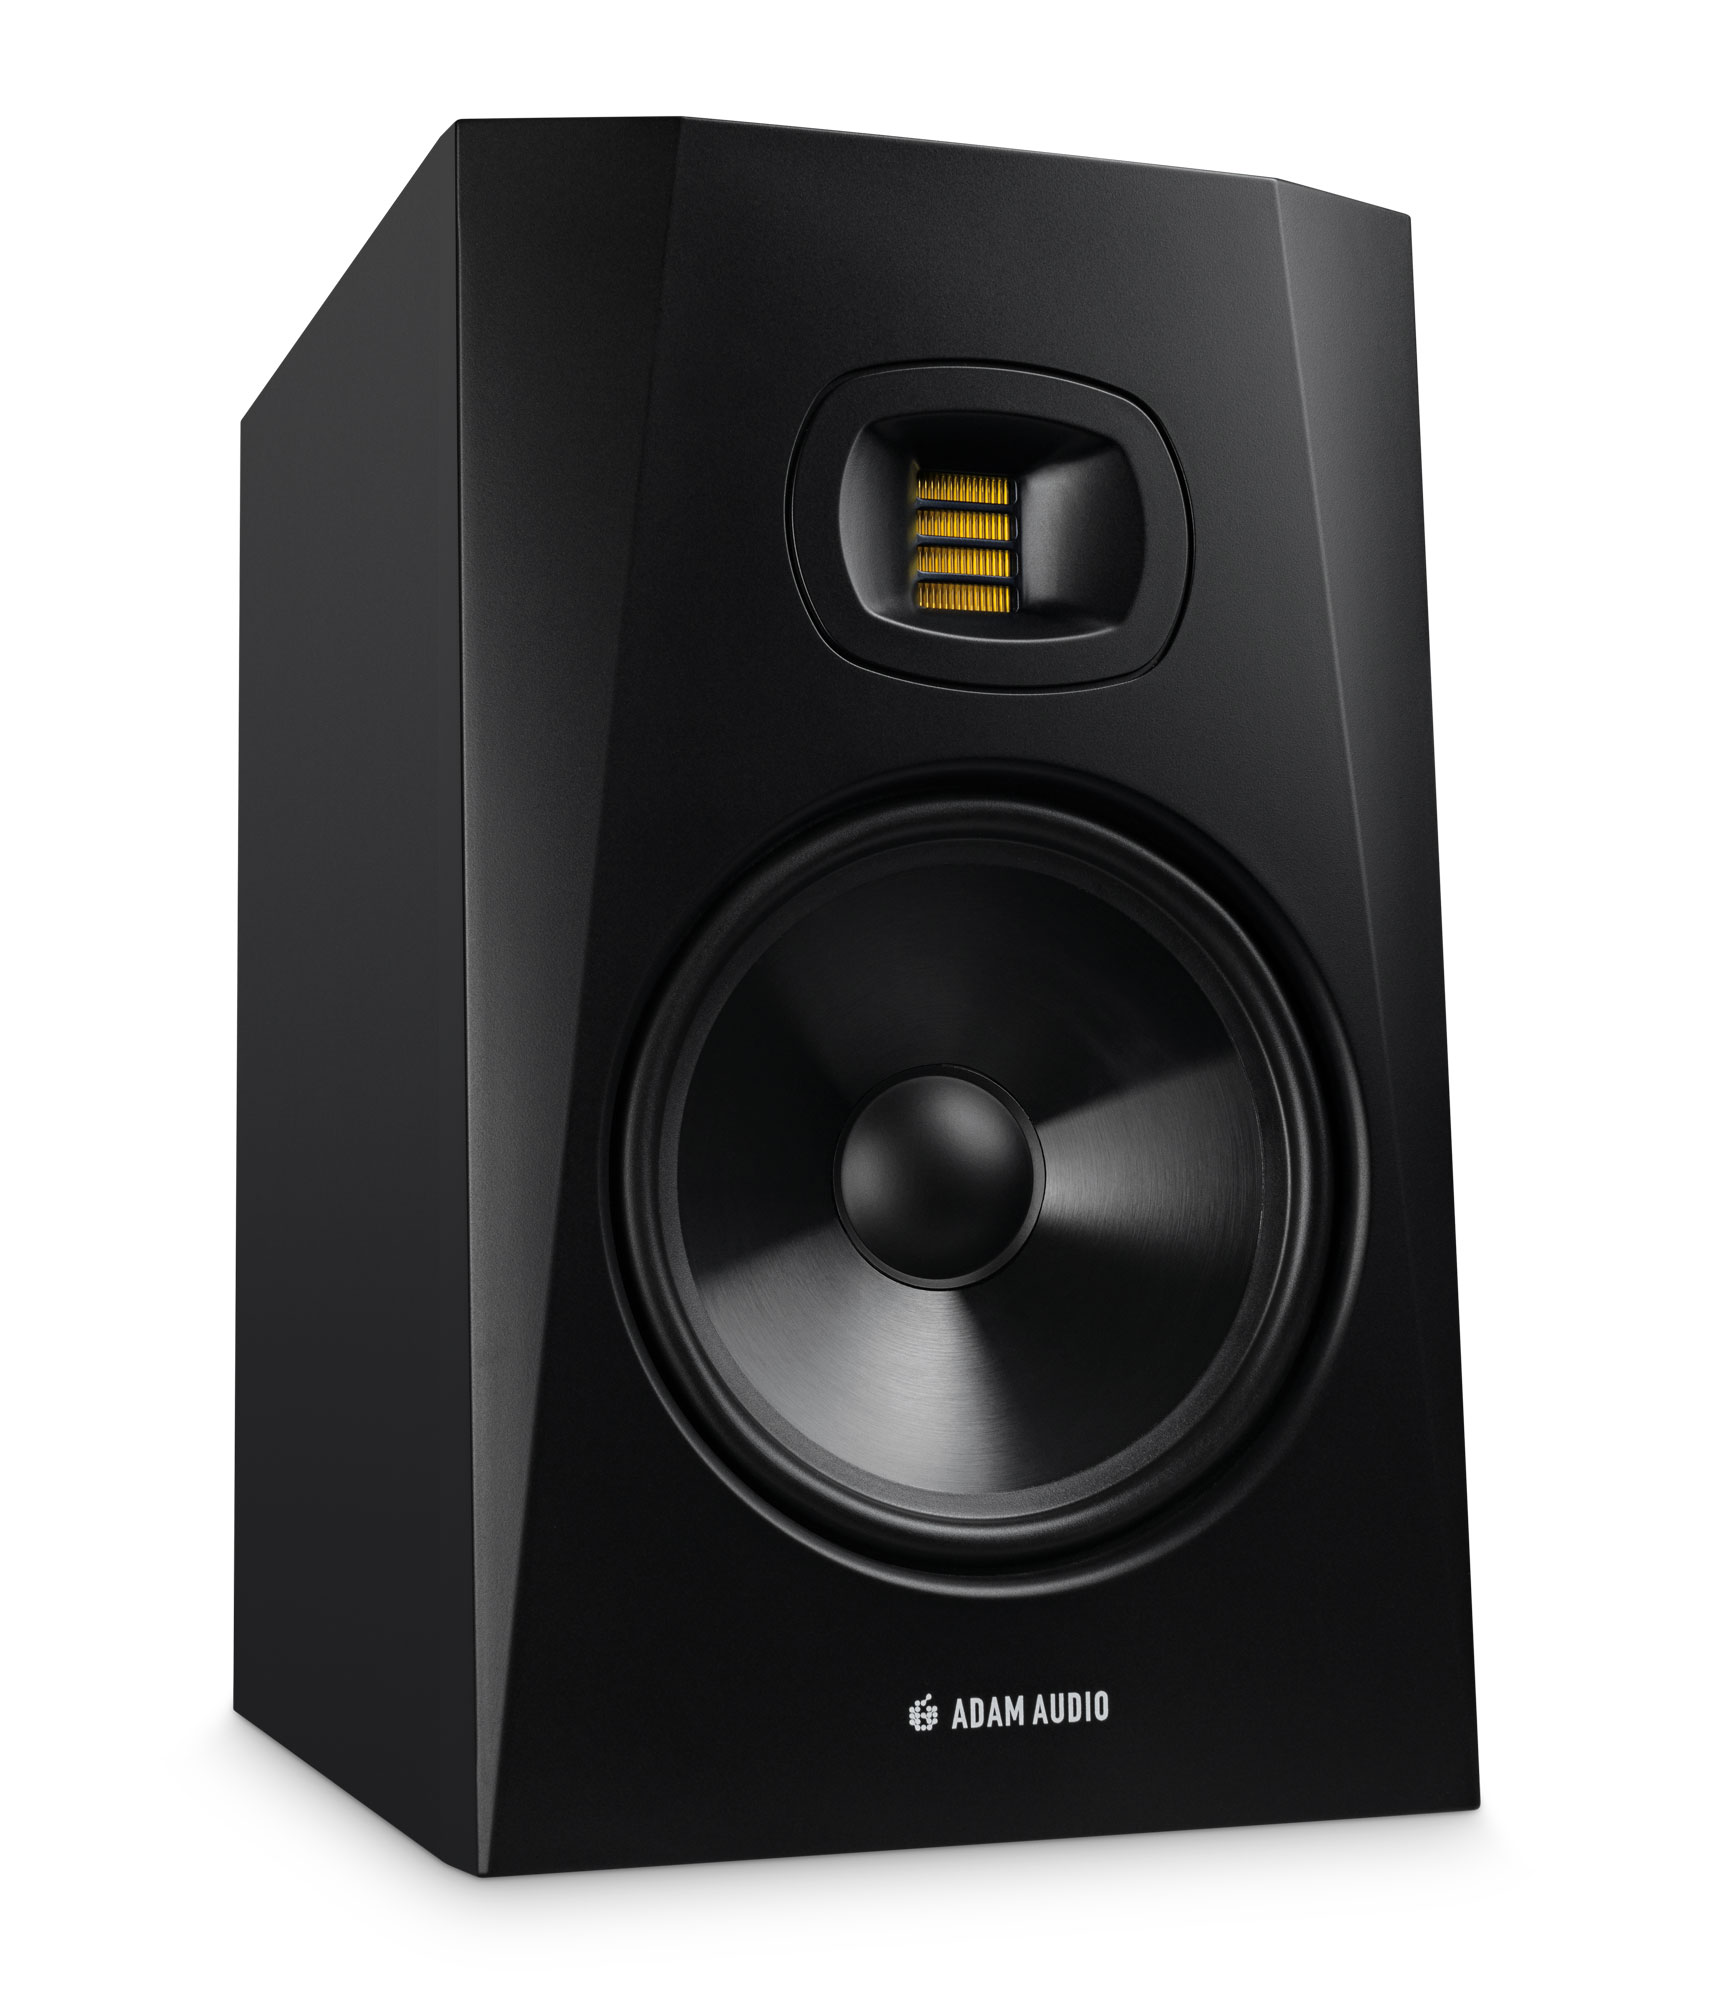 Studiomonitore - Adam Audio T8V - Onlineshop Musikhaus Kirstein